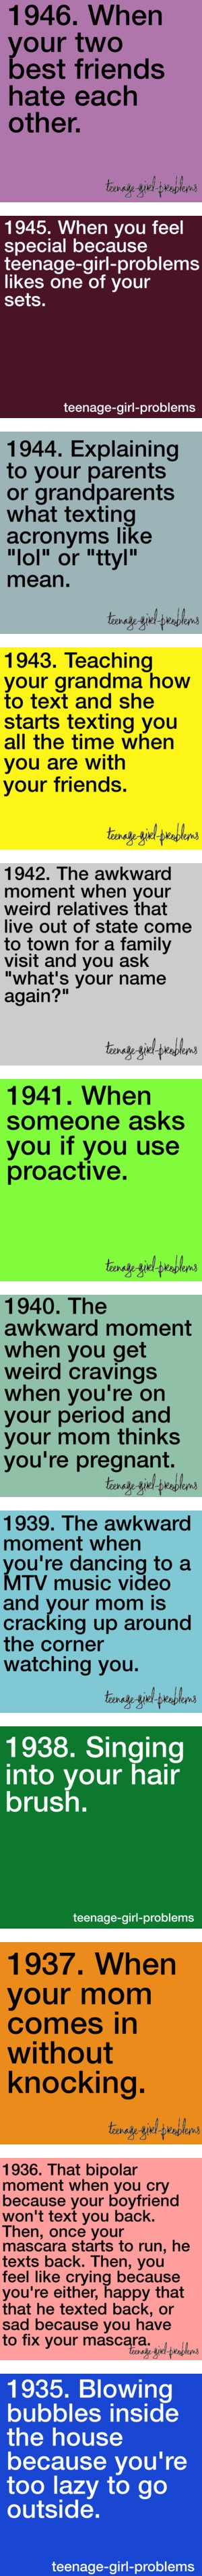 """Teenage Girl Problems 1899-1998"" by teenage-girl-problems ❤ liked on Polyvore"